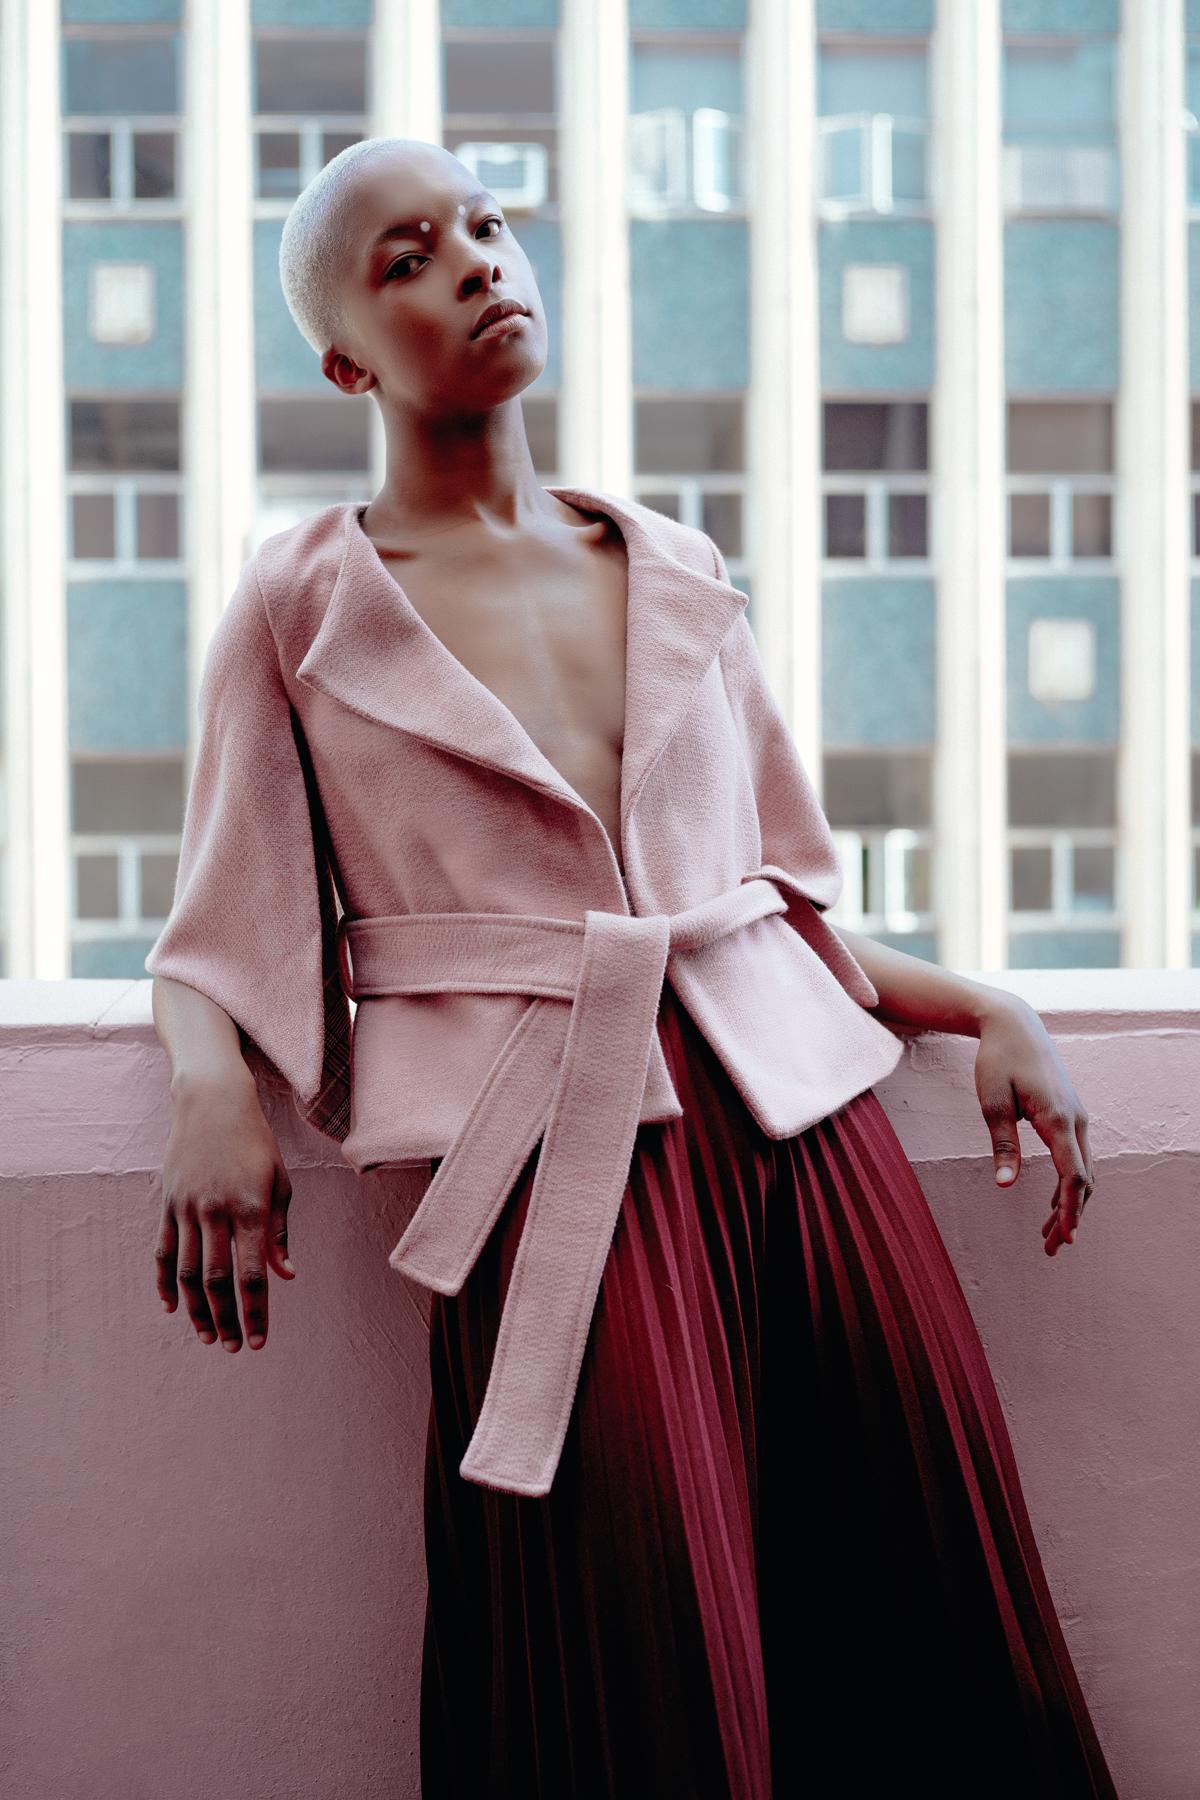 Photo Credit: VOGUE Italia Photo series: South African Fashion, Andrea Baioni 99 Juta Street Johannesburg